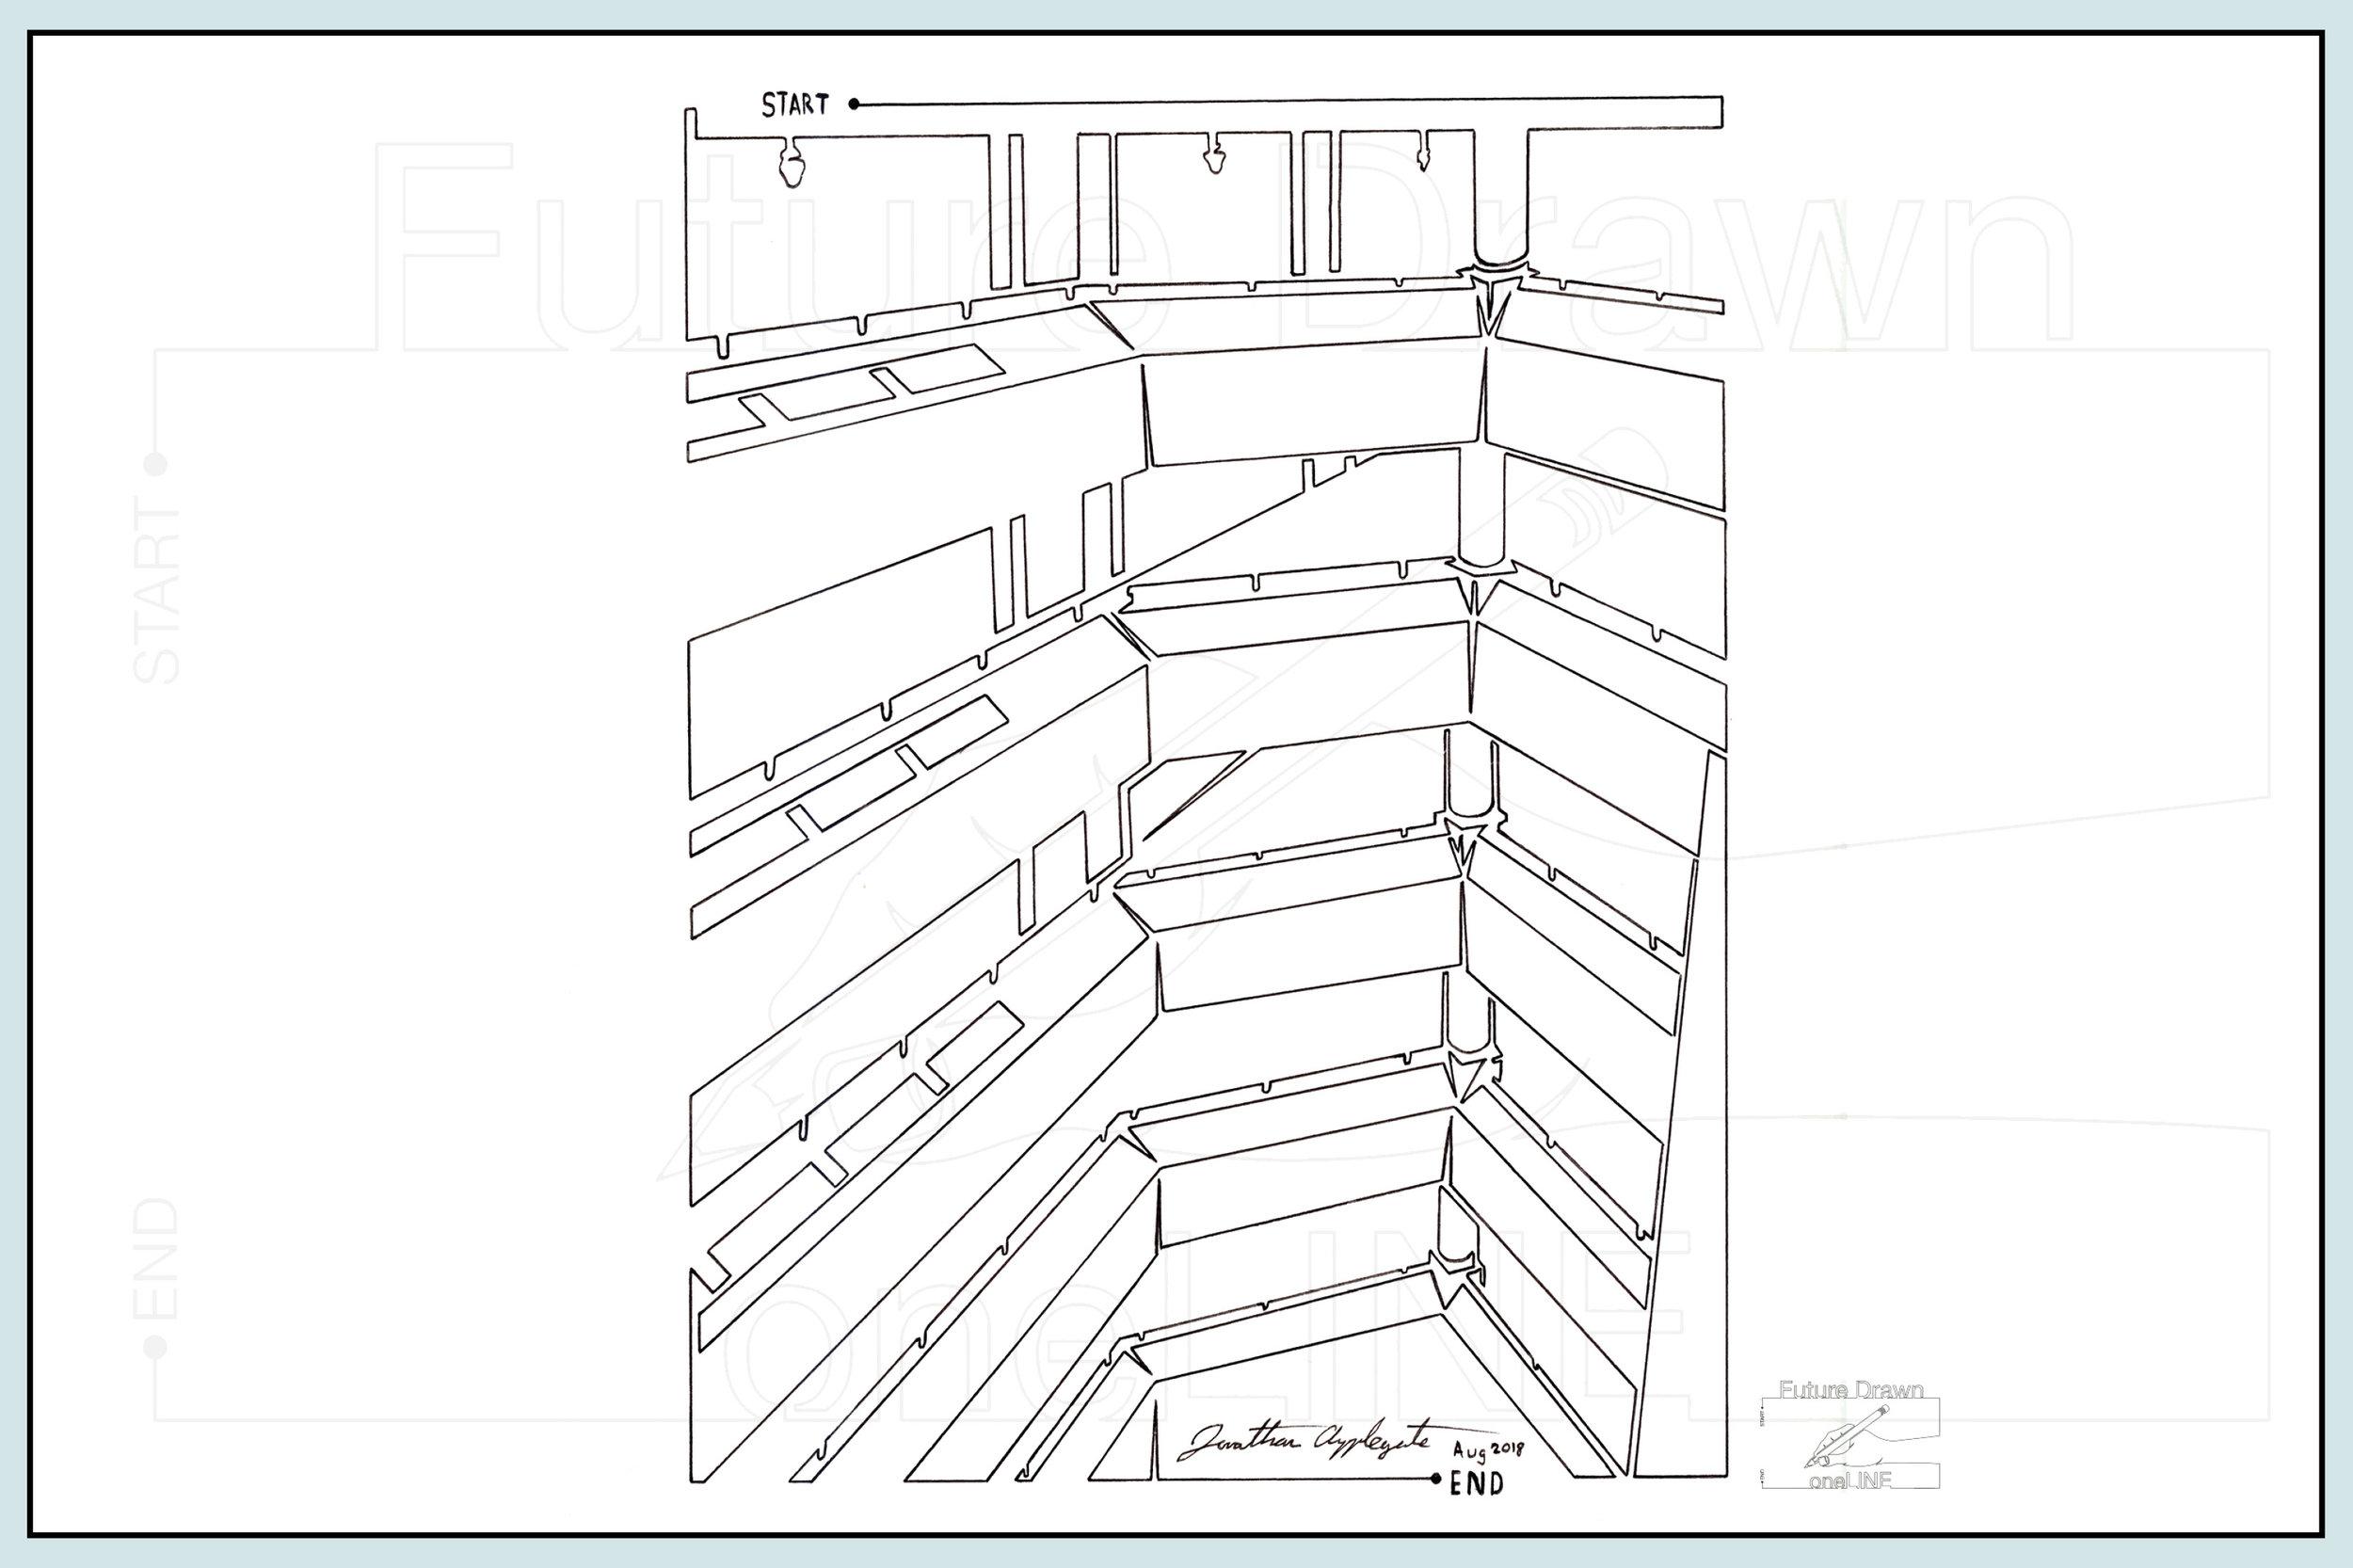 Web- Hotel Attrium- oneLINE Future Drawn Applegate.jpg